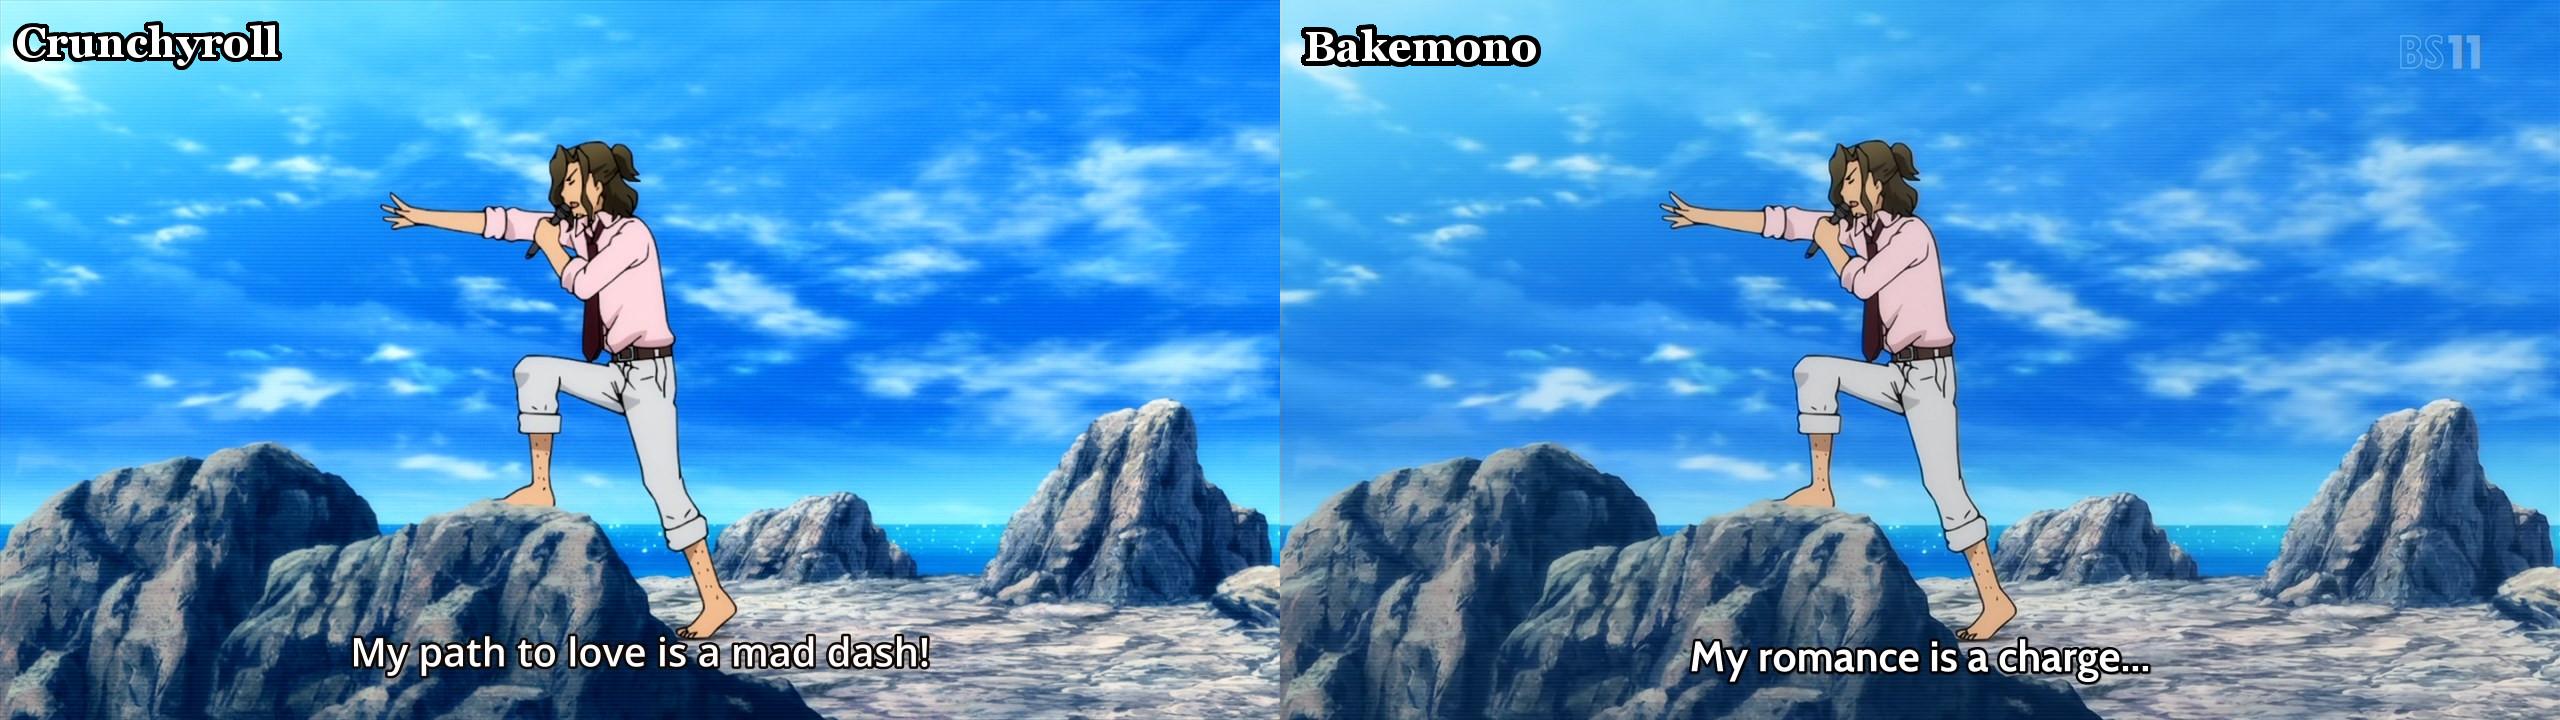 crunchyroll_versus_bakemono_-_trickster_-_1b